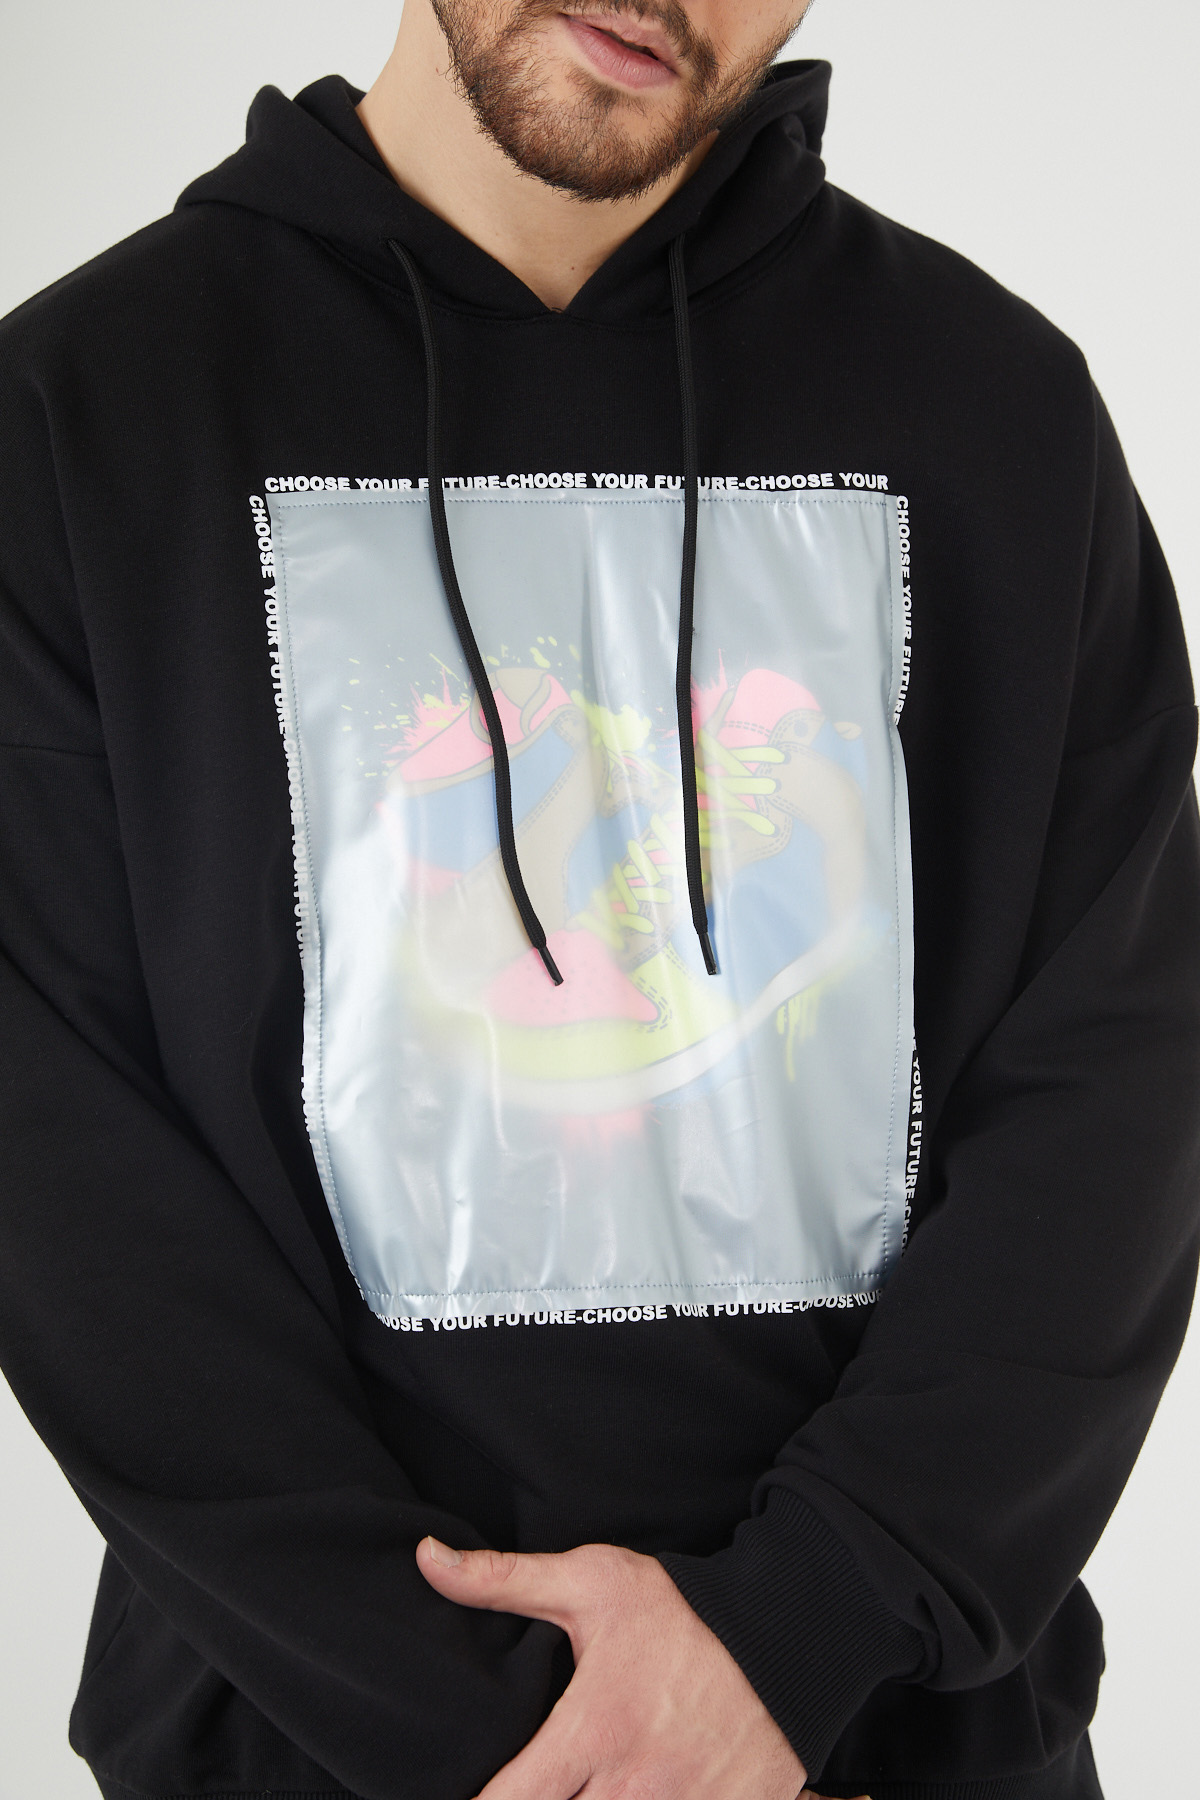 XHAN - Siyah Baskılı Kapüşonlu Sweatshirt 1KXE8-44393-02